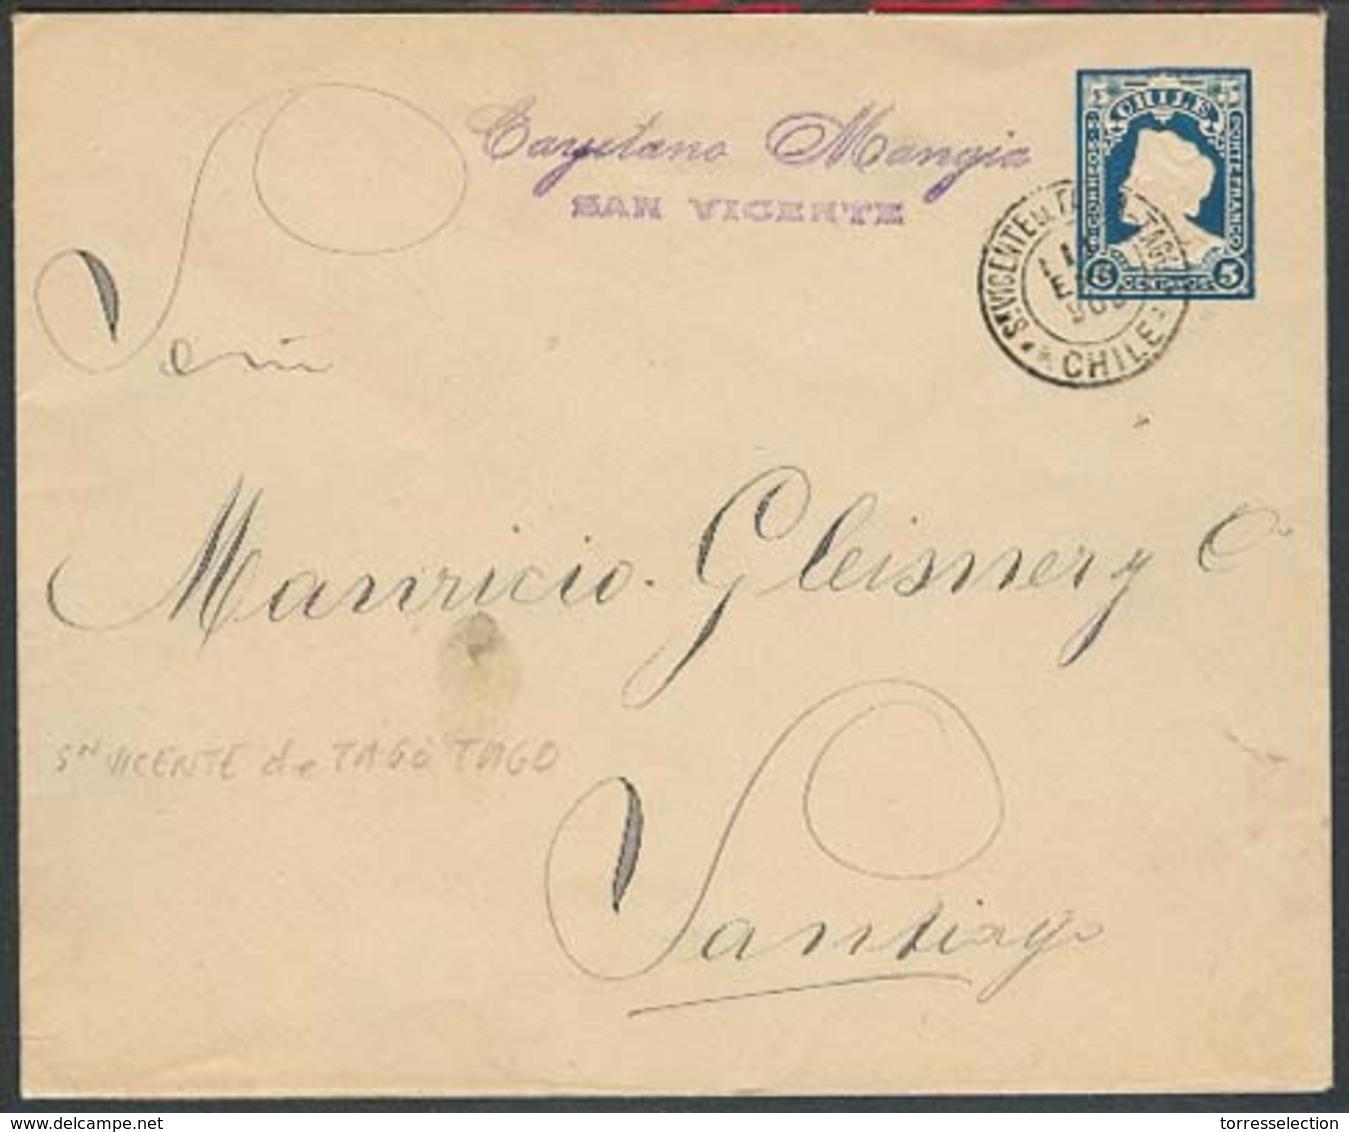 CHILE - Stationery. 1903. San Vicente De Tago Tago - Stgo 5c Squared Type Stat Env. Unusual Town Usage + Scarce Size. VF - Chile